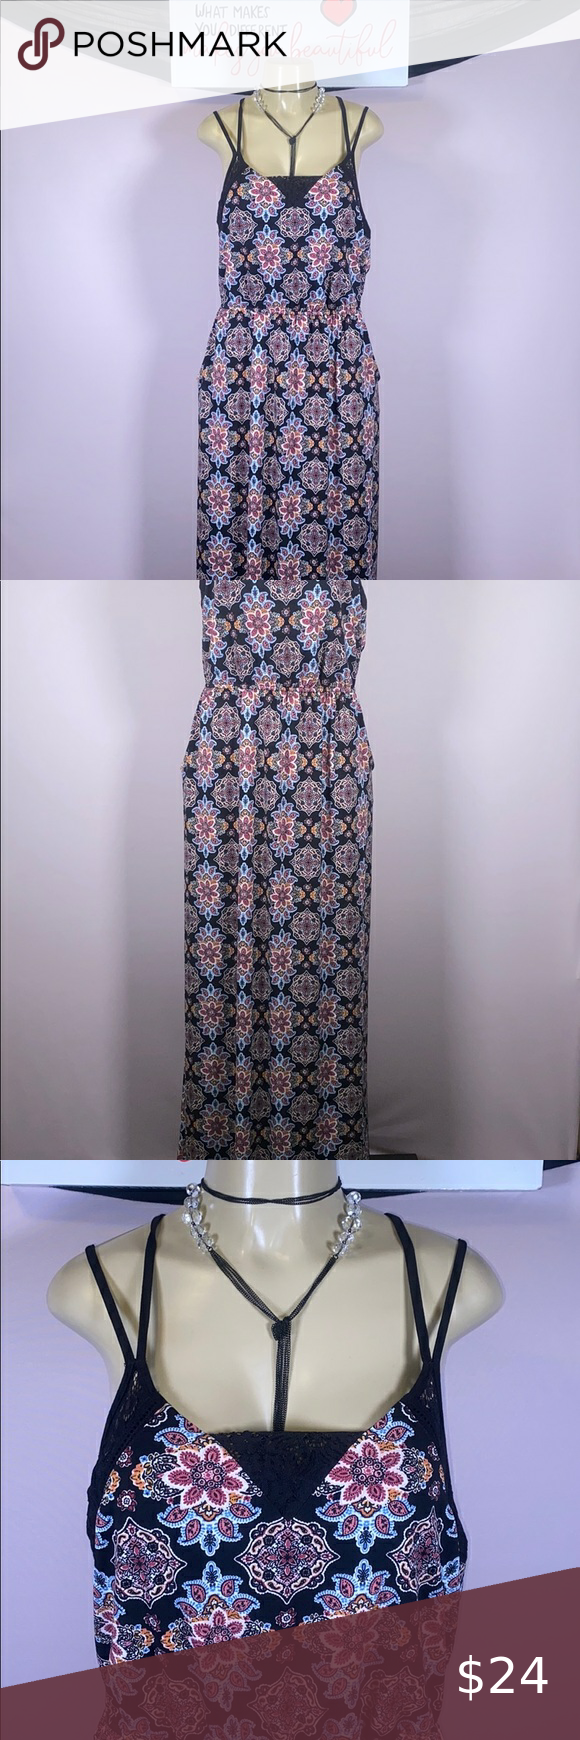 Xhilaration Maxi Dress Size Xxl Maxi Dress Beautiful Maxi Dresses Clothes Design [ 1740 x 580 Pixel ]